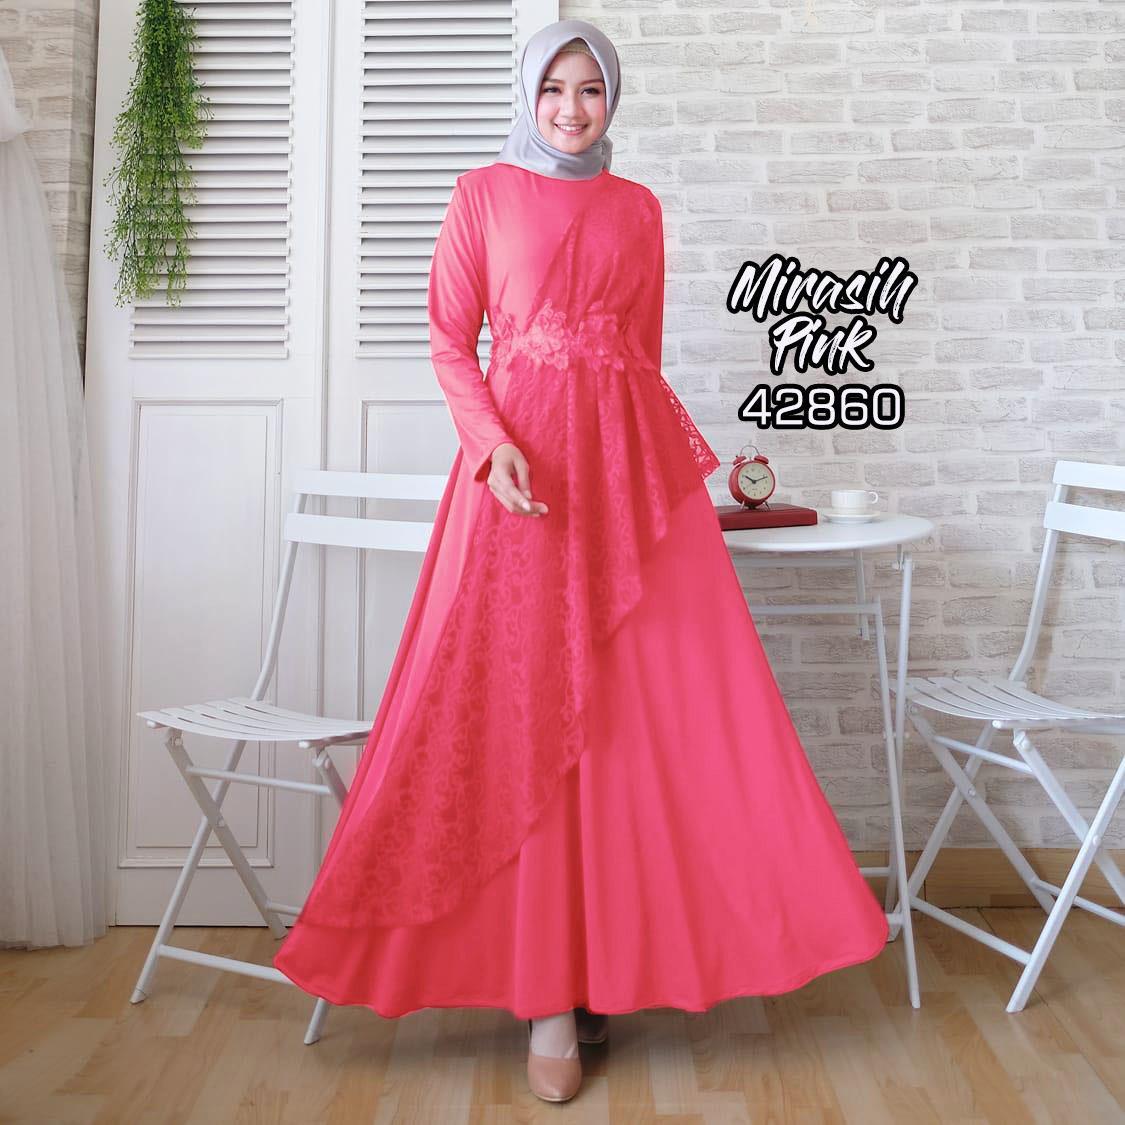 TotallyGreatShop Gamis Pesta Brukat Premium Original real pic Fashion Busana Kondangan Muslimah Gaun Kebaya Pesta Brokat